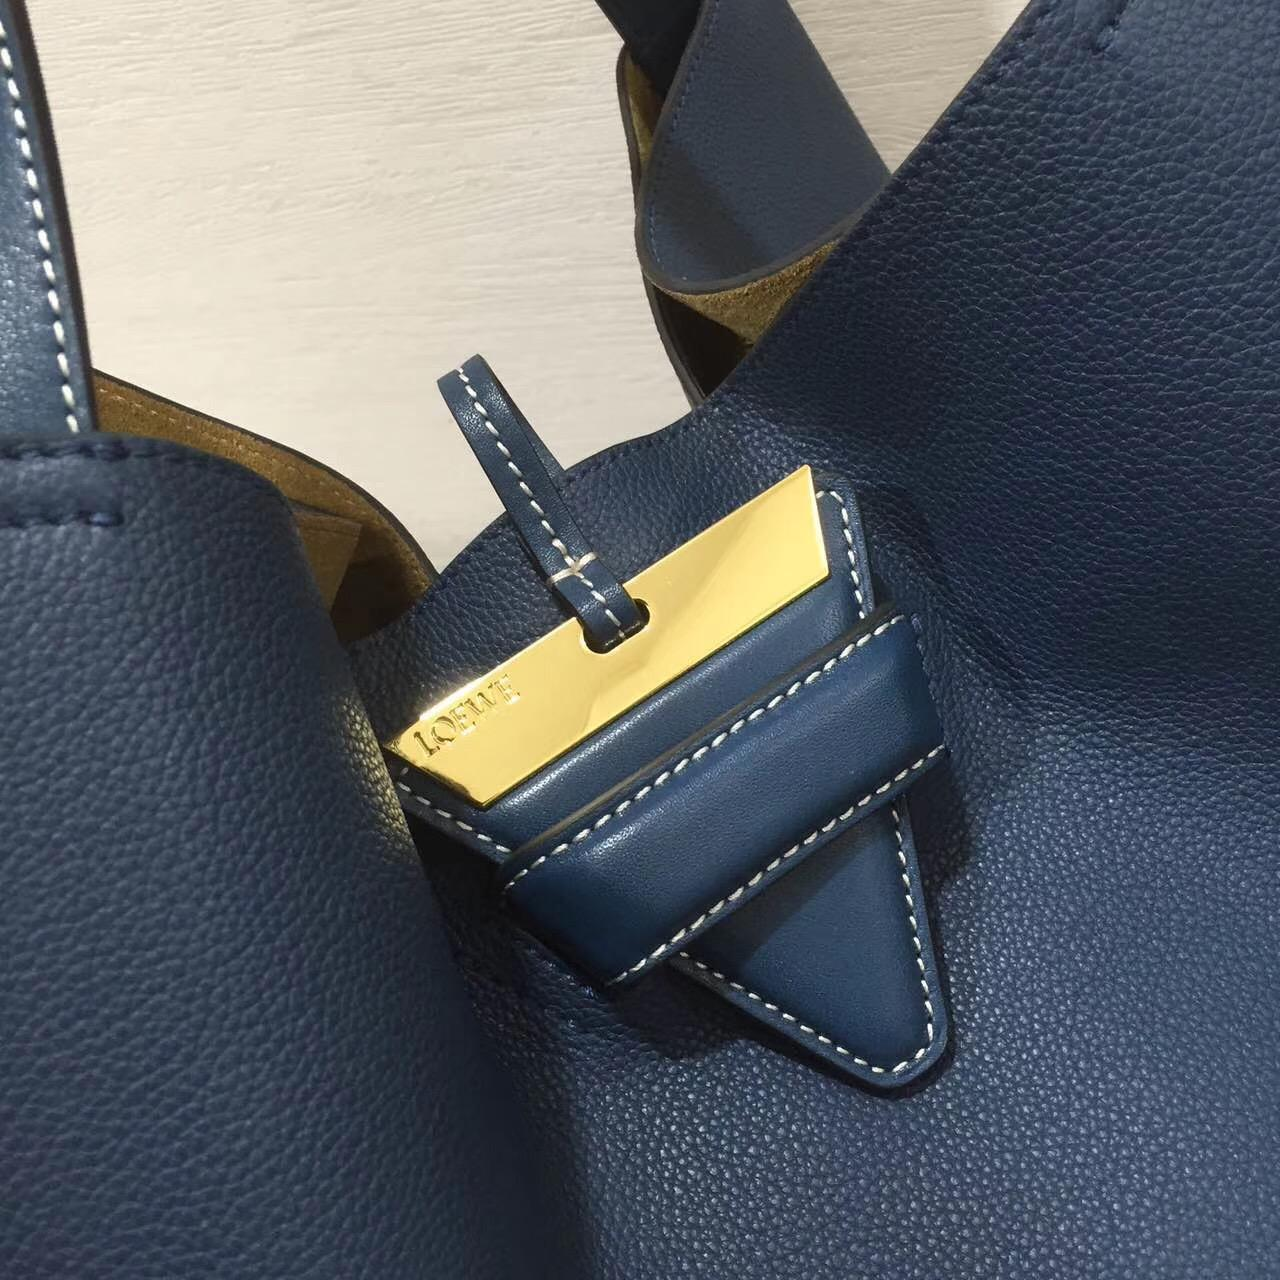 loewe羅意威巴塞羅那包 Barcelona Tote Bag 海军蓝色旅行袋